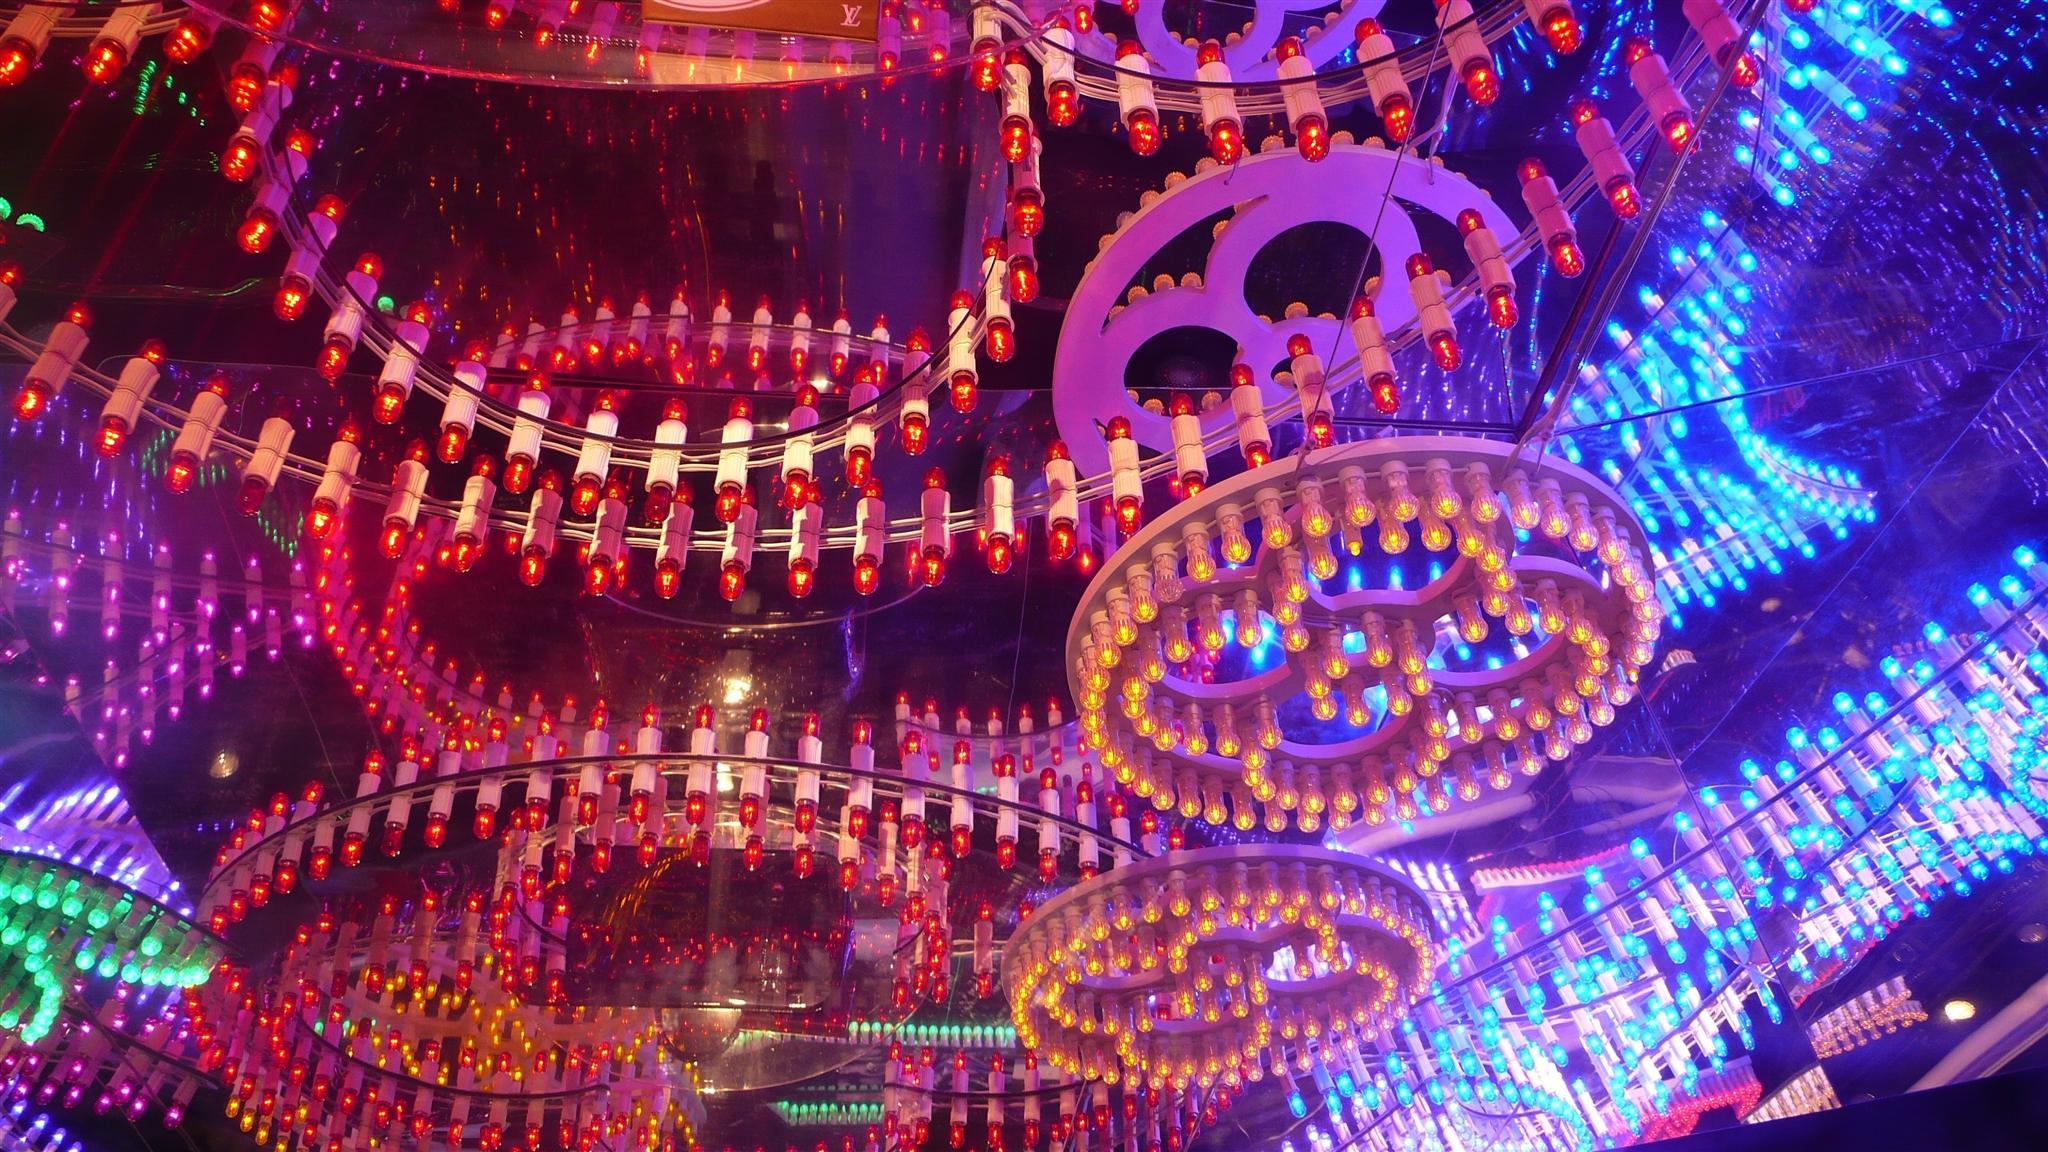 Lumix Weihnachtsbeleuchtung.Hintergrundbilder Nacht Lila Weihnachtsbeleuchtung Thailand